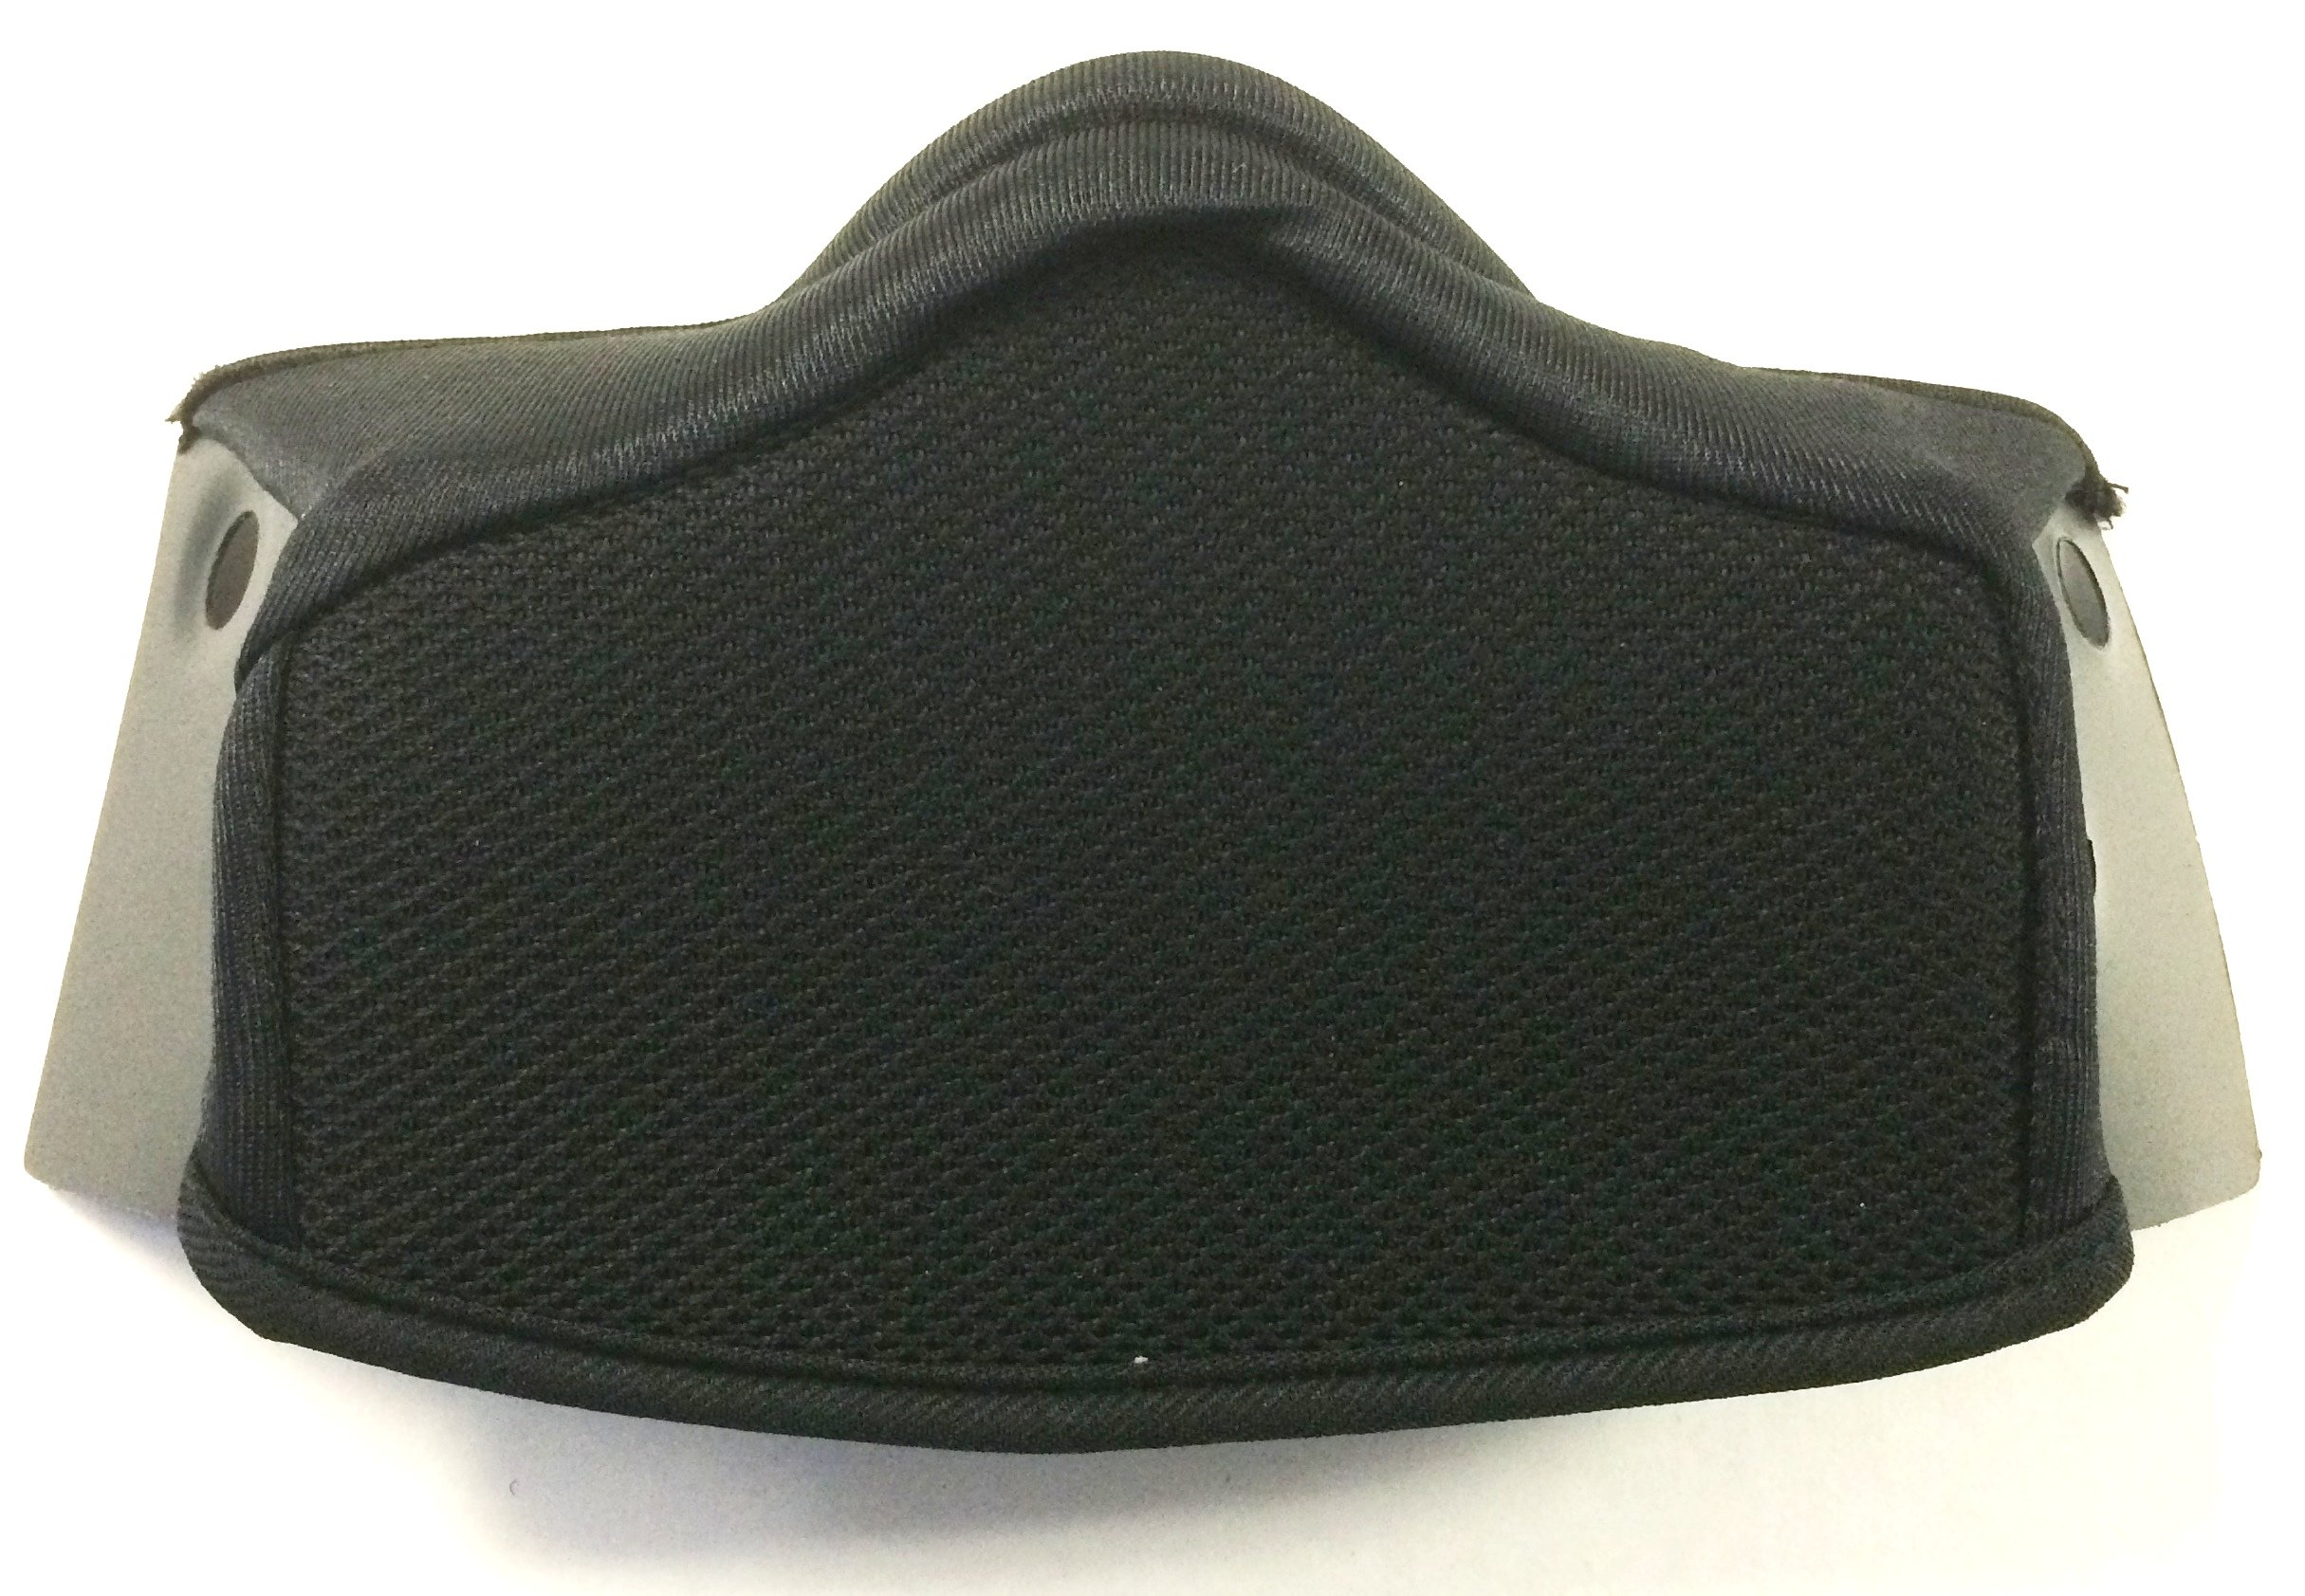 Typhoon Helmets Breath Box for G339 Adult Modular Helmet (sizes small, medium, large)